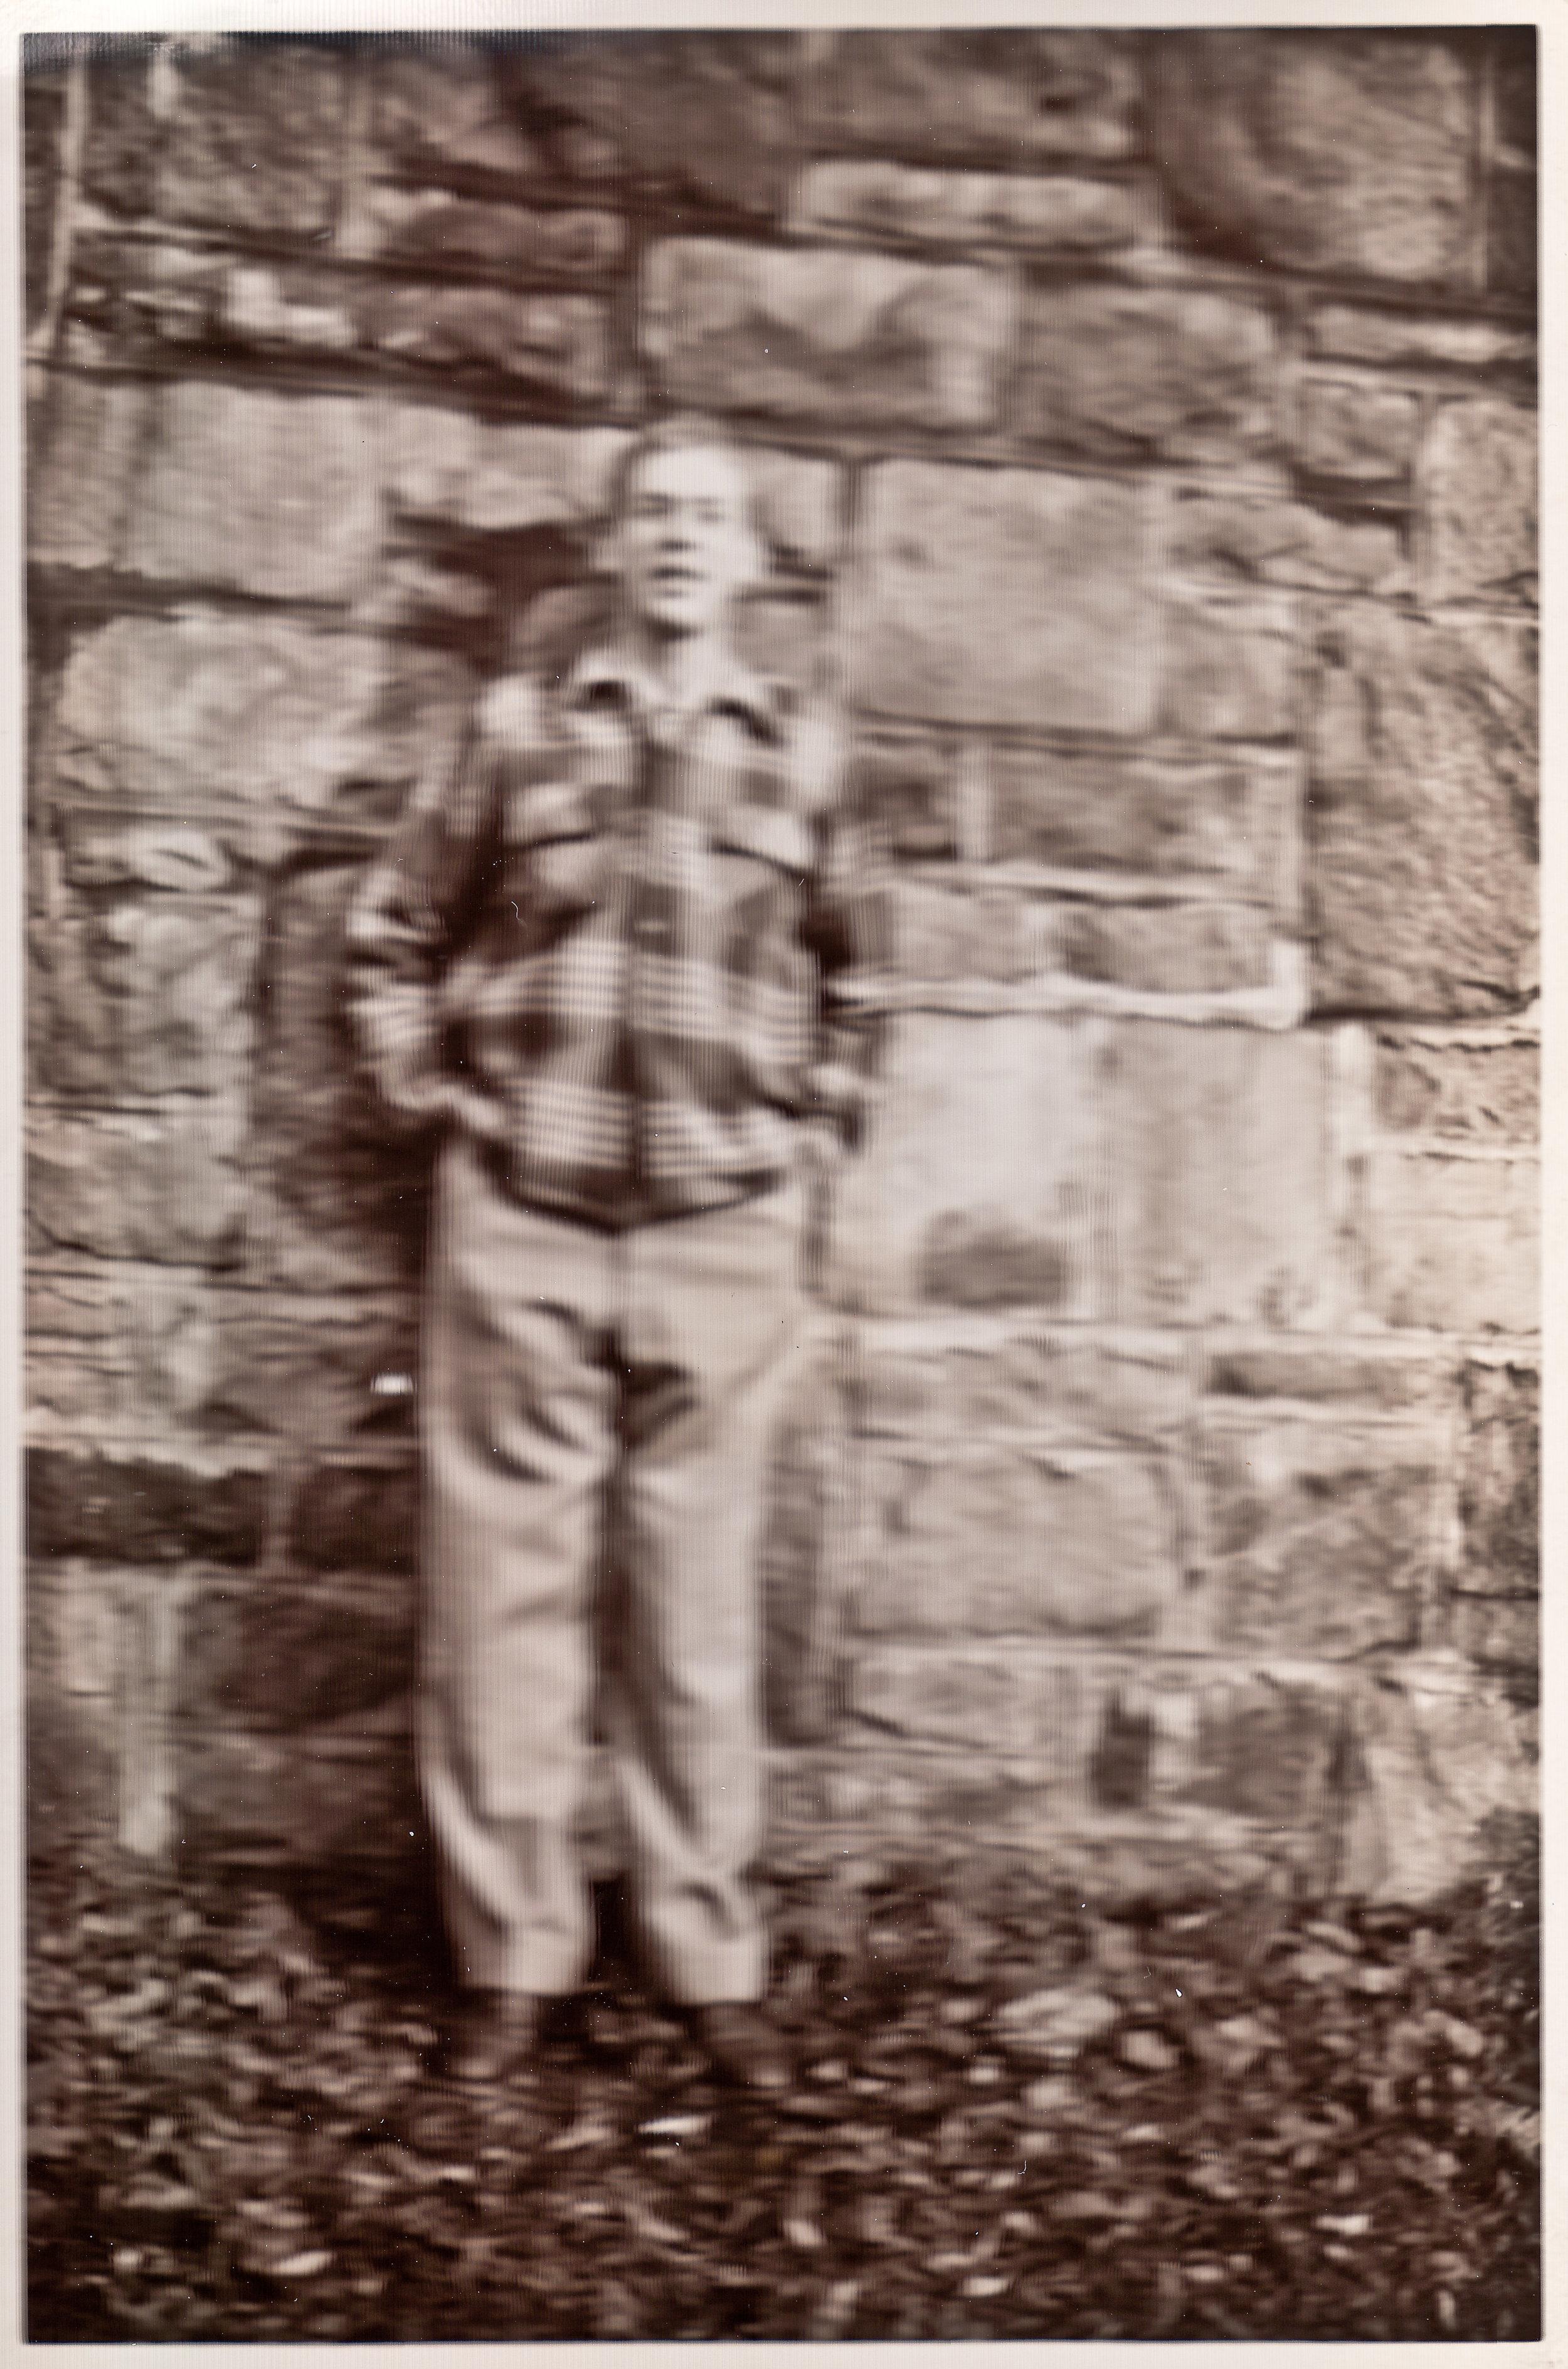 Morty, Lehigh University - Jan 12, 1946